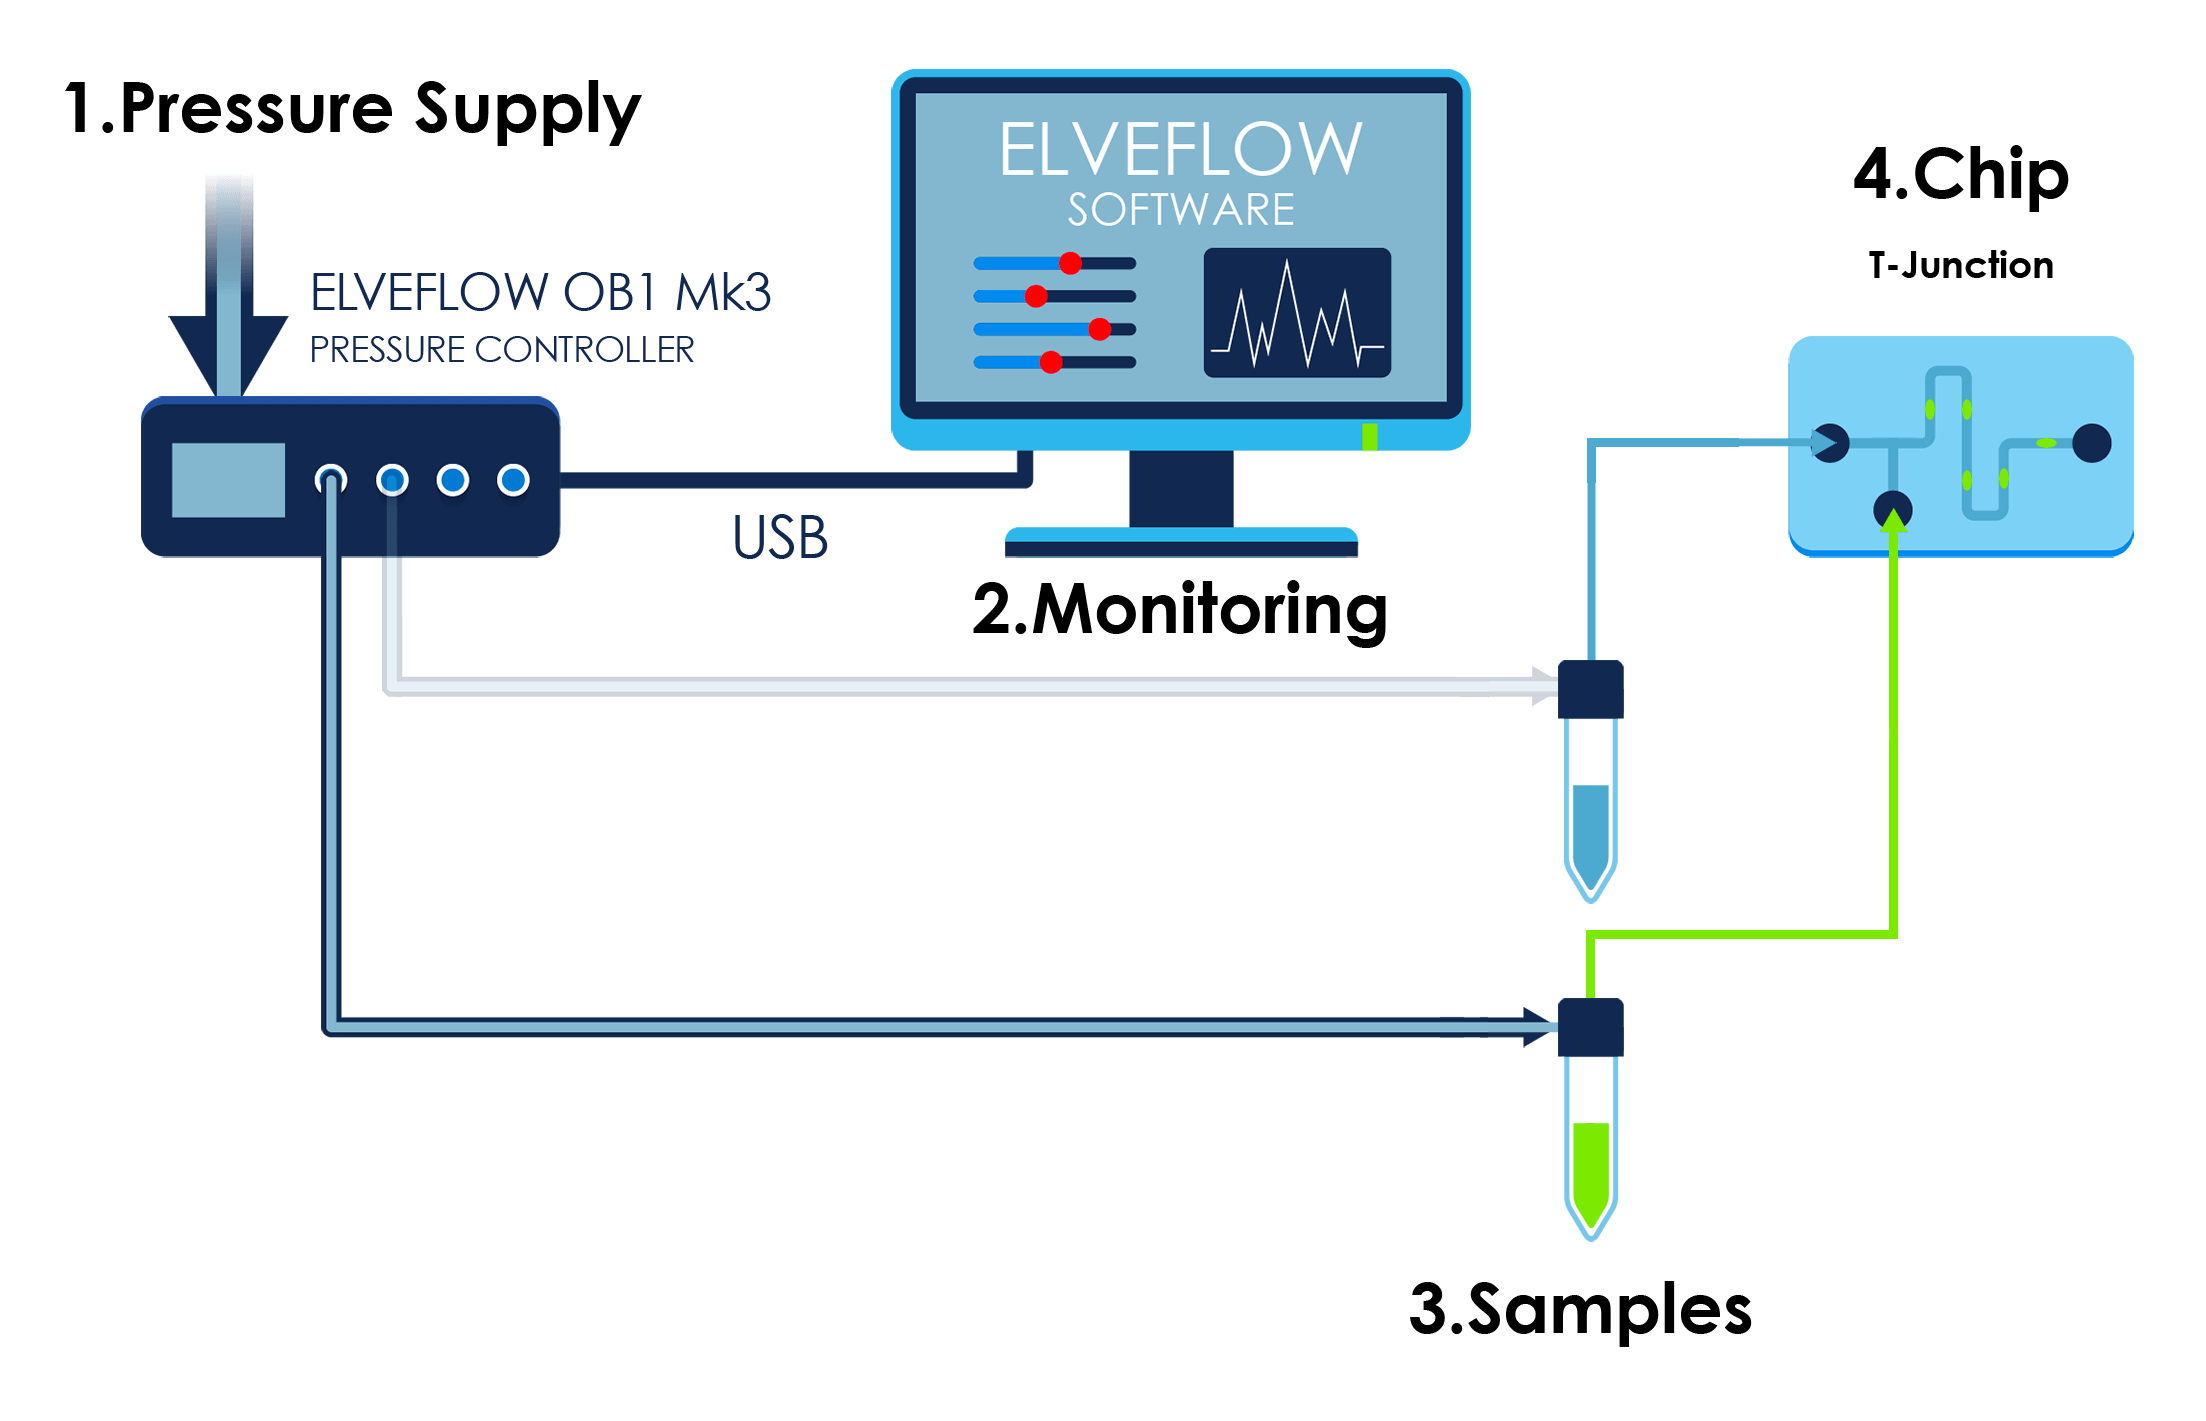 microfluidic droplet emulsion T-junction pressure control